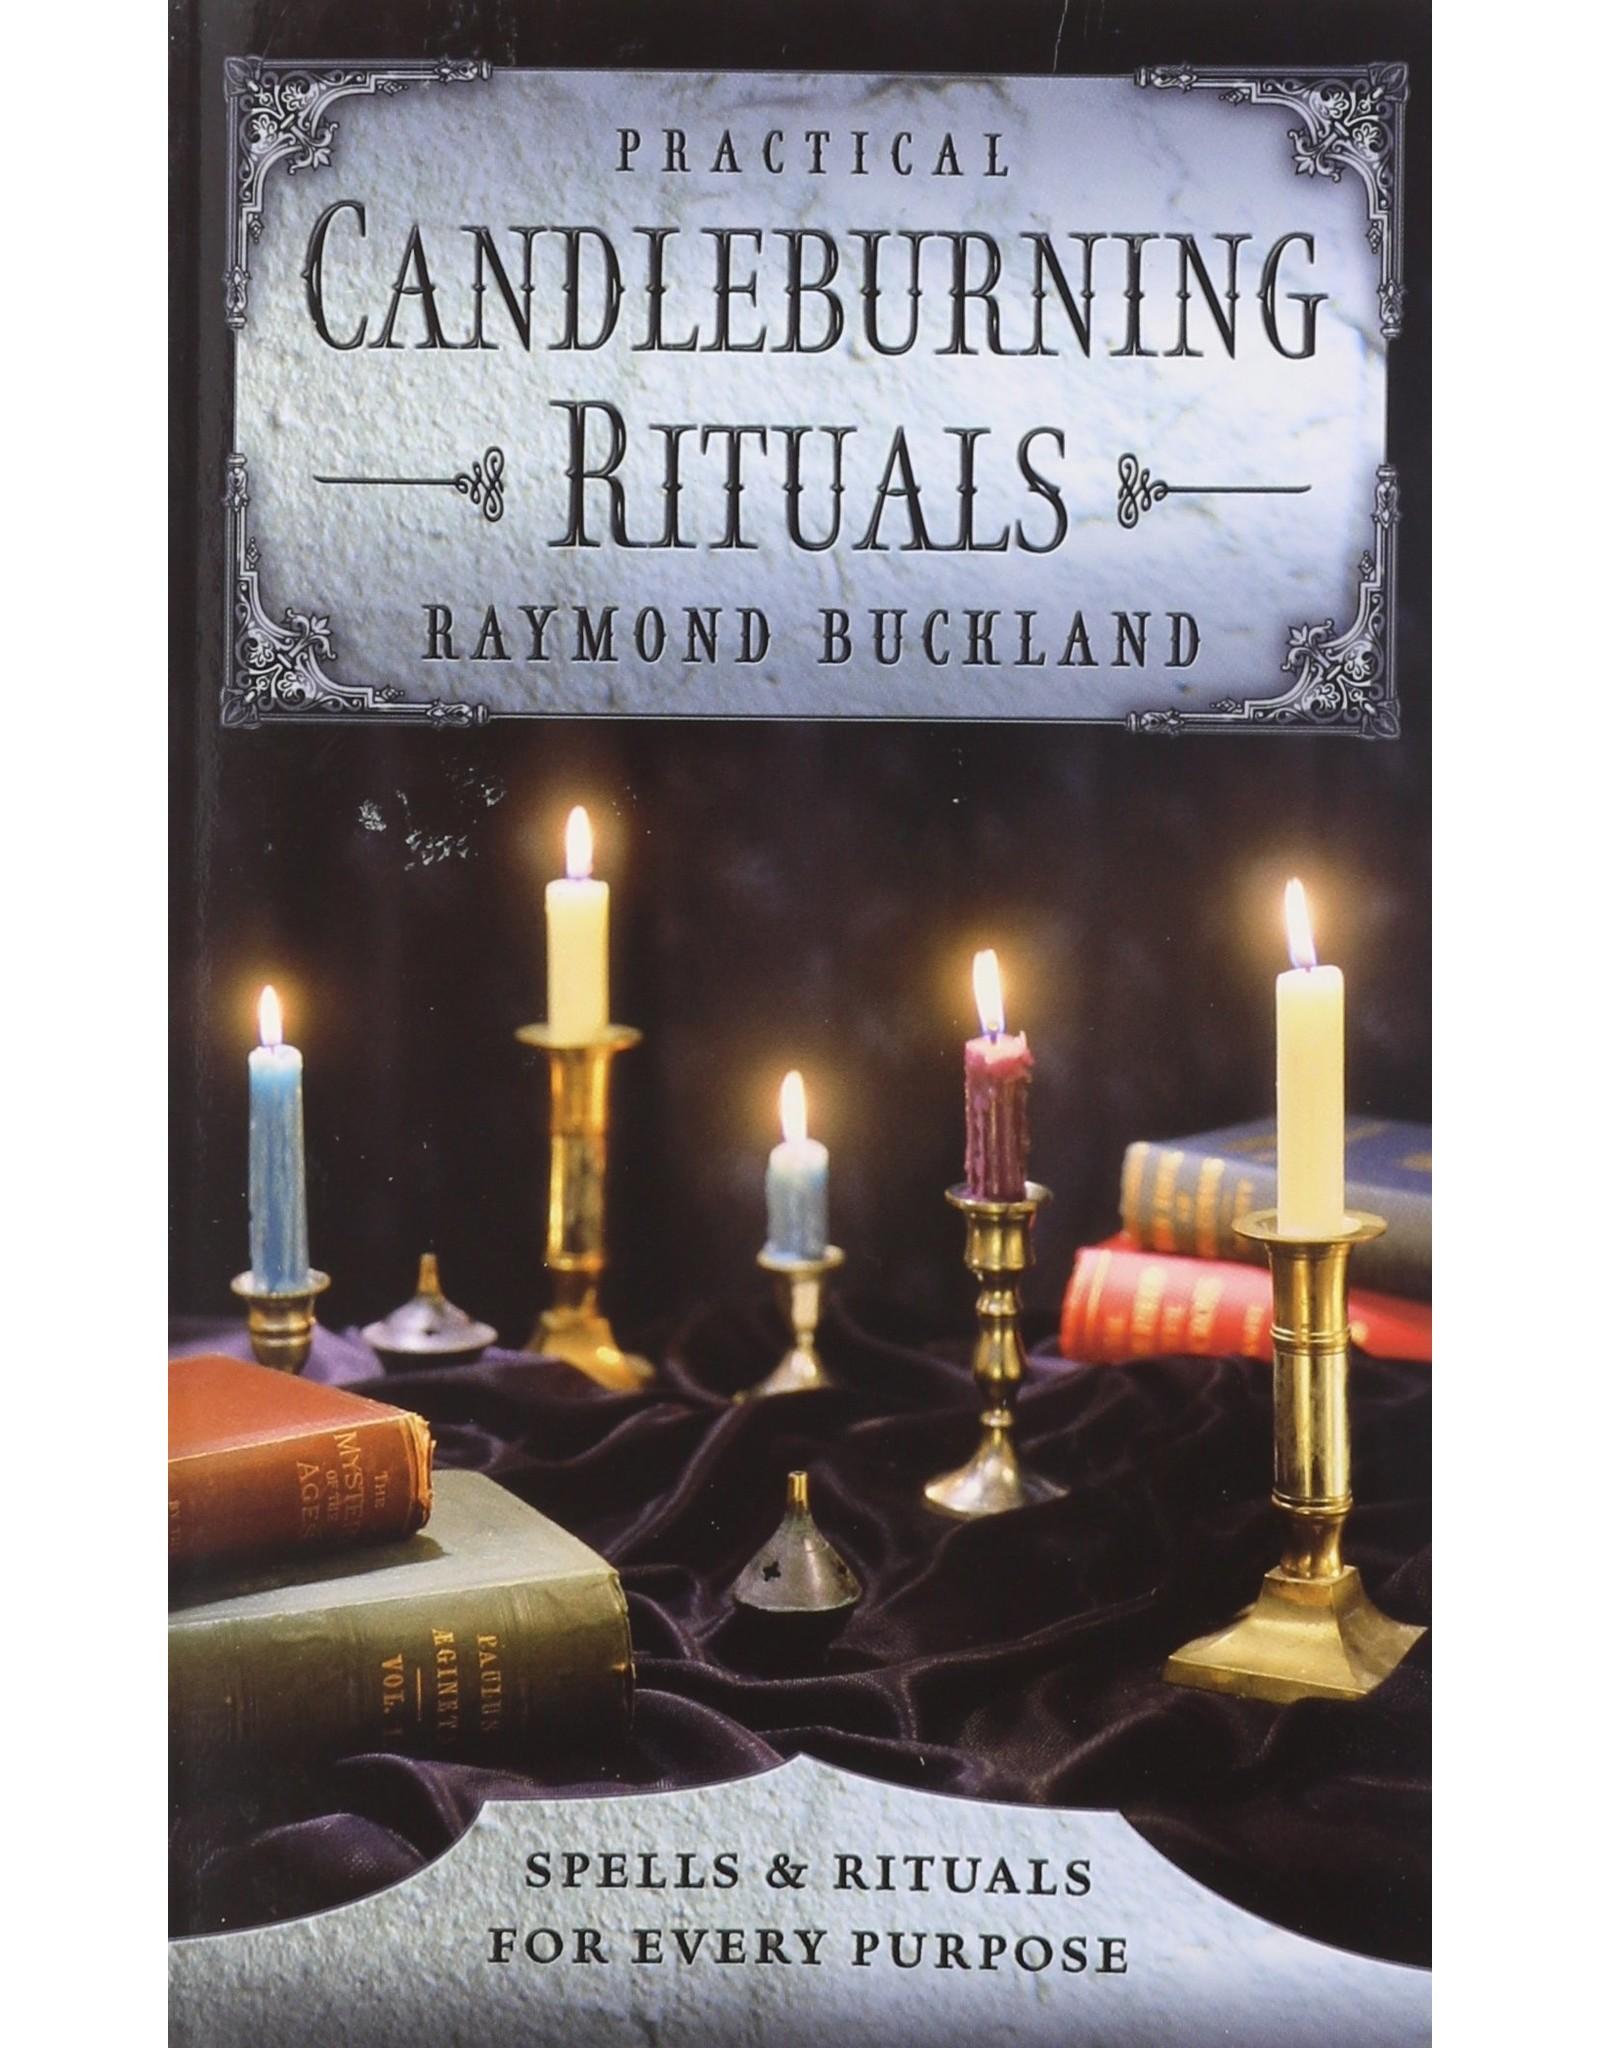 Practical Candleburning Rituals